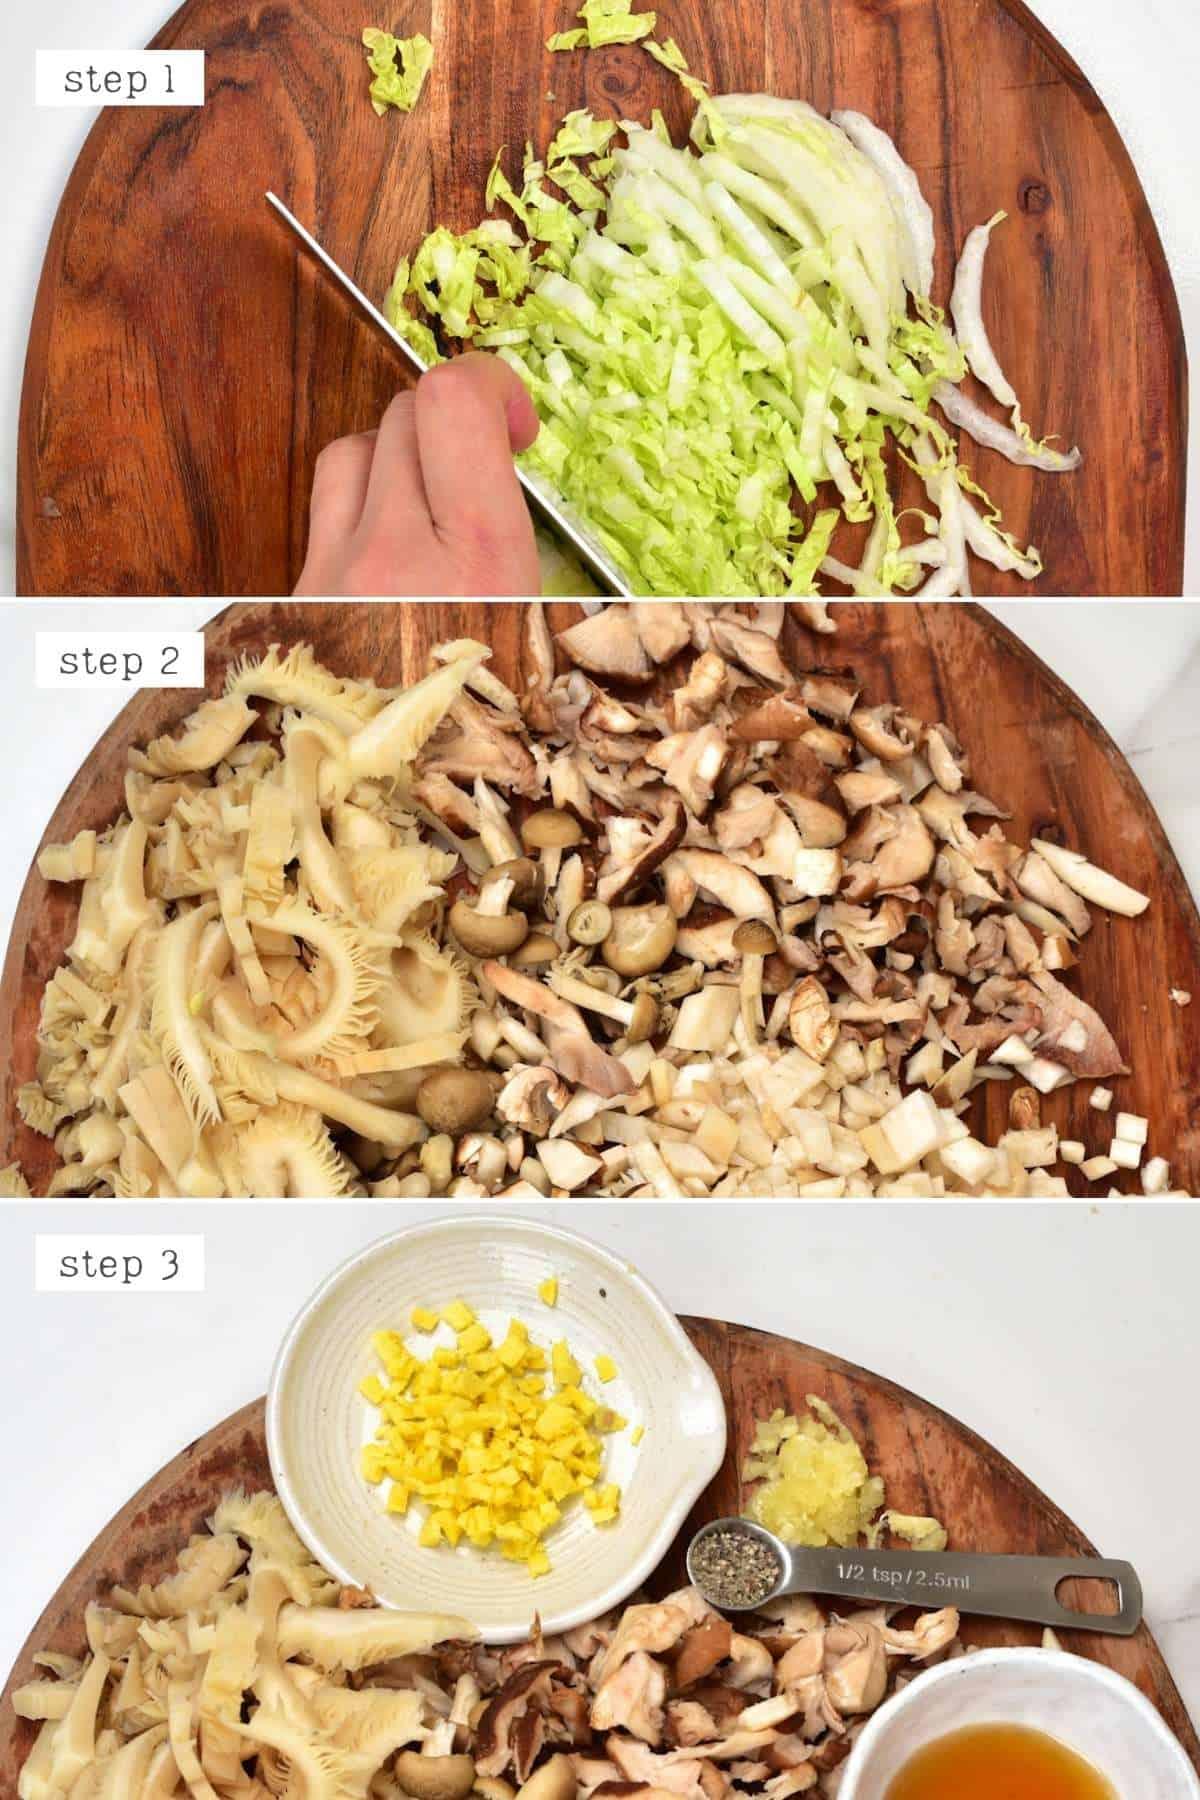 Steps for chopping dumpling ingredients